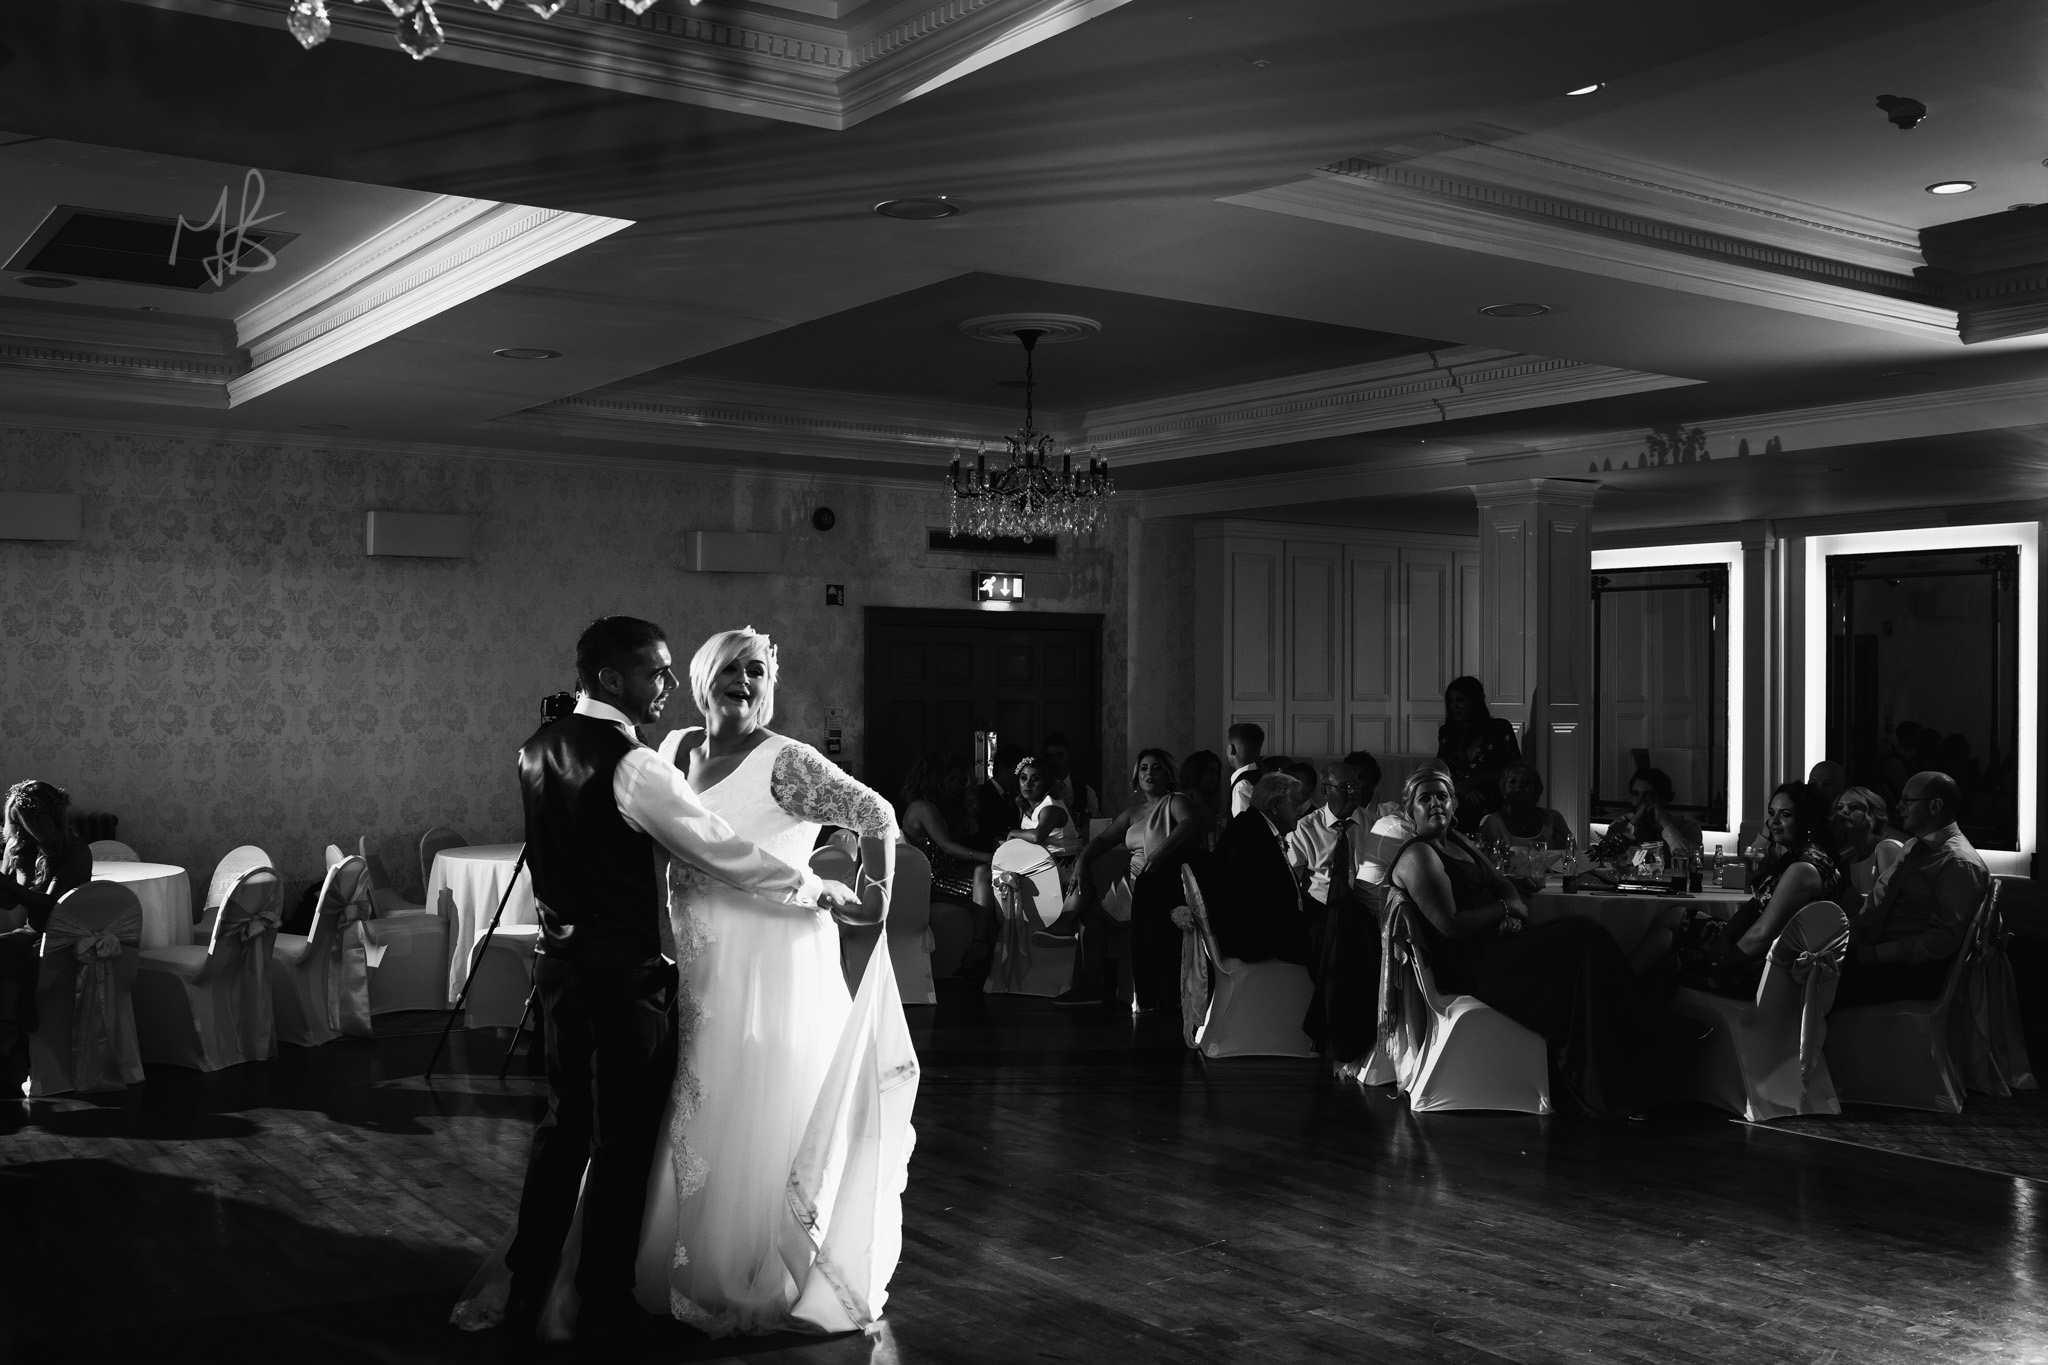 Northern-Ireland-Wedding-Photographer-Mark-Barnes-Ballymena_wedding-photography-Leighinmohr-House-Seamas_Alanna_For-web-50.jpg